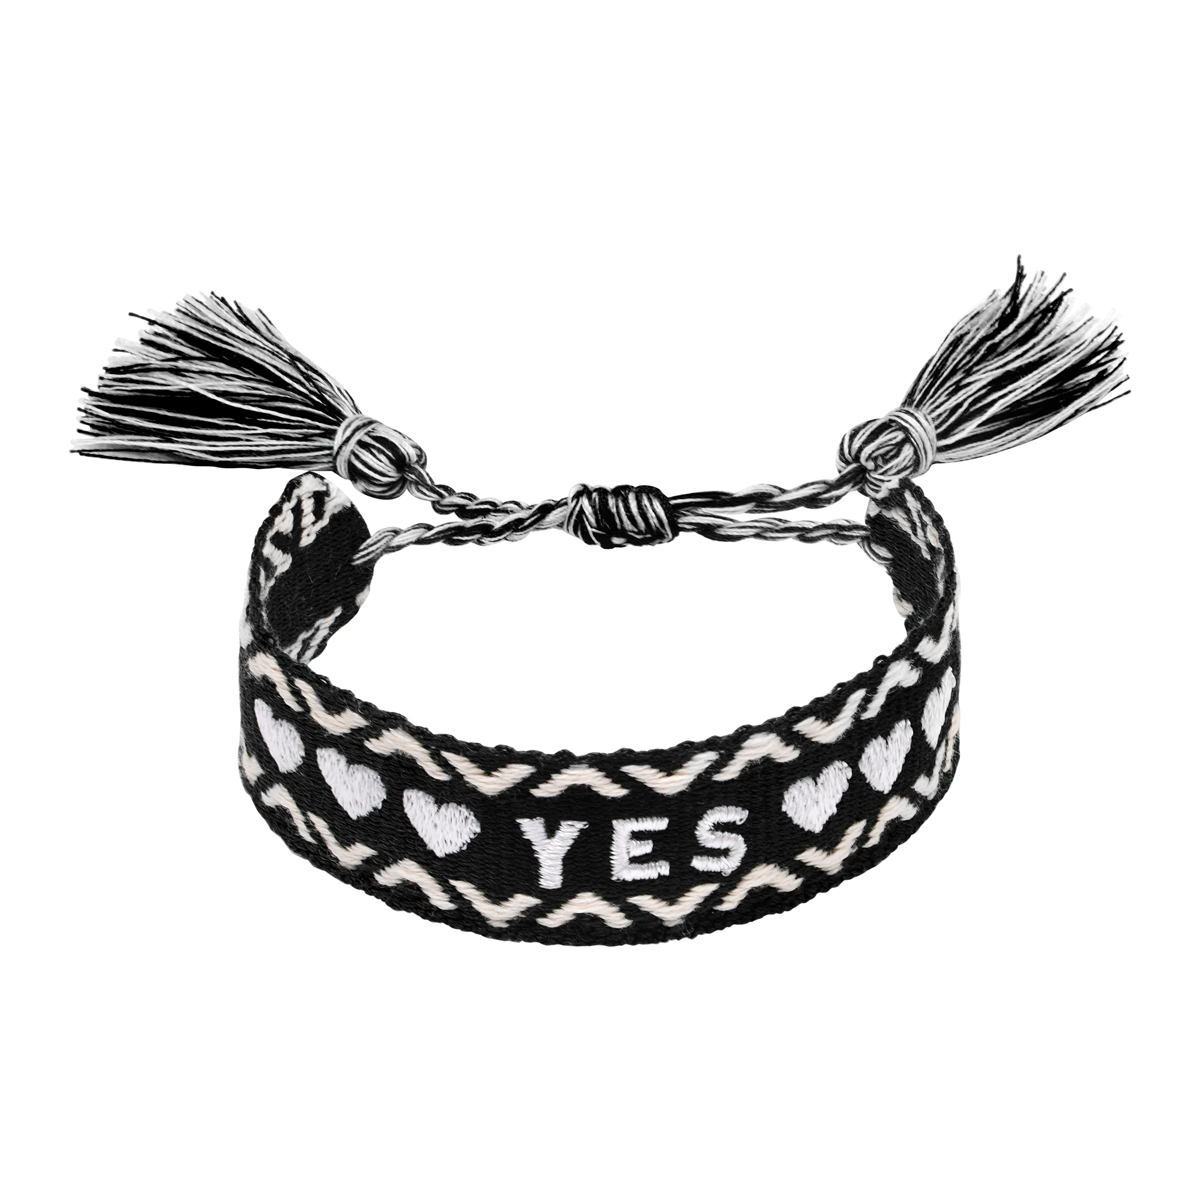 Bracelet Woven Yes